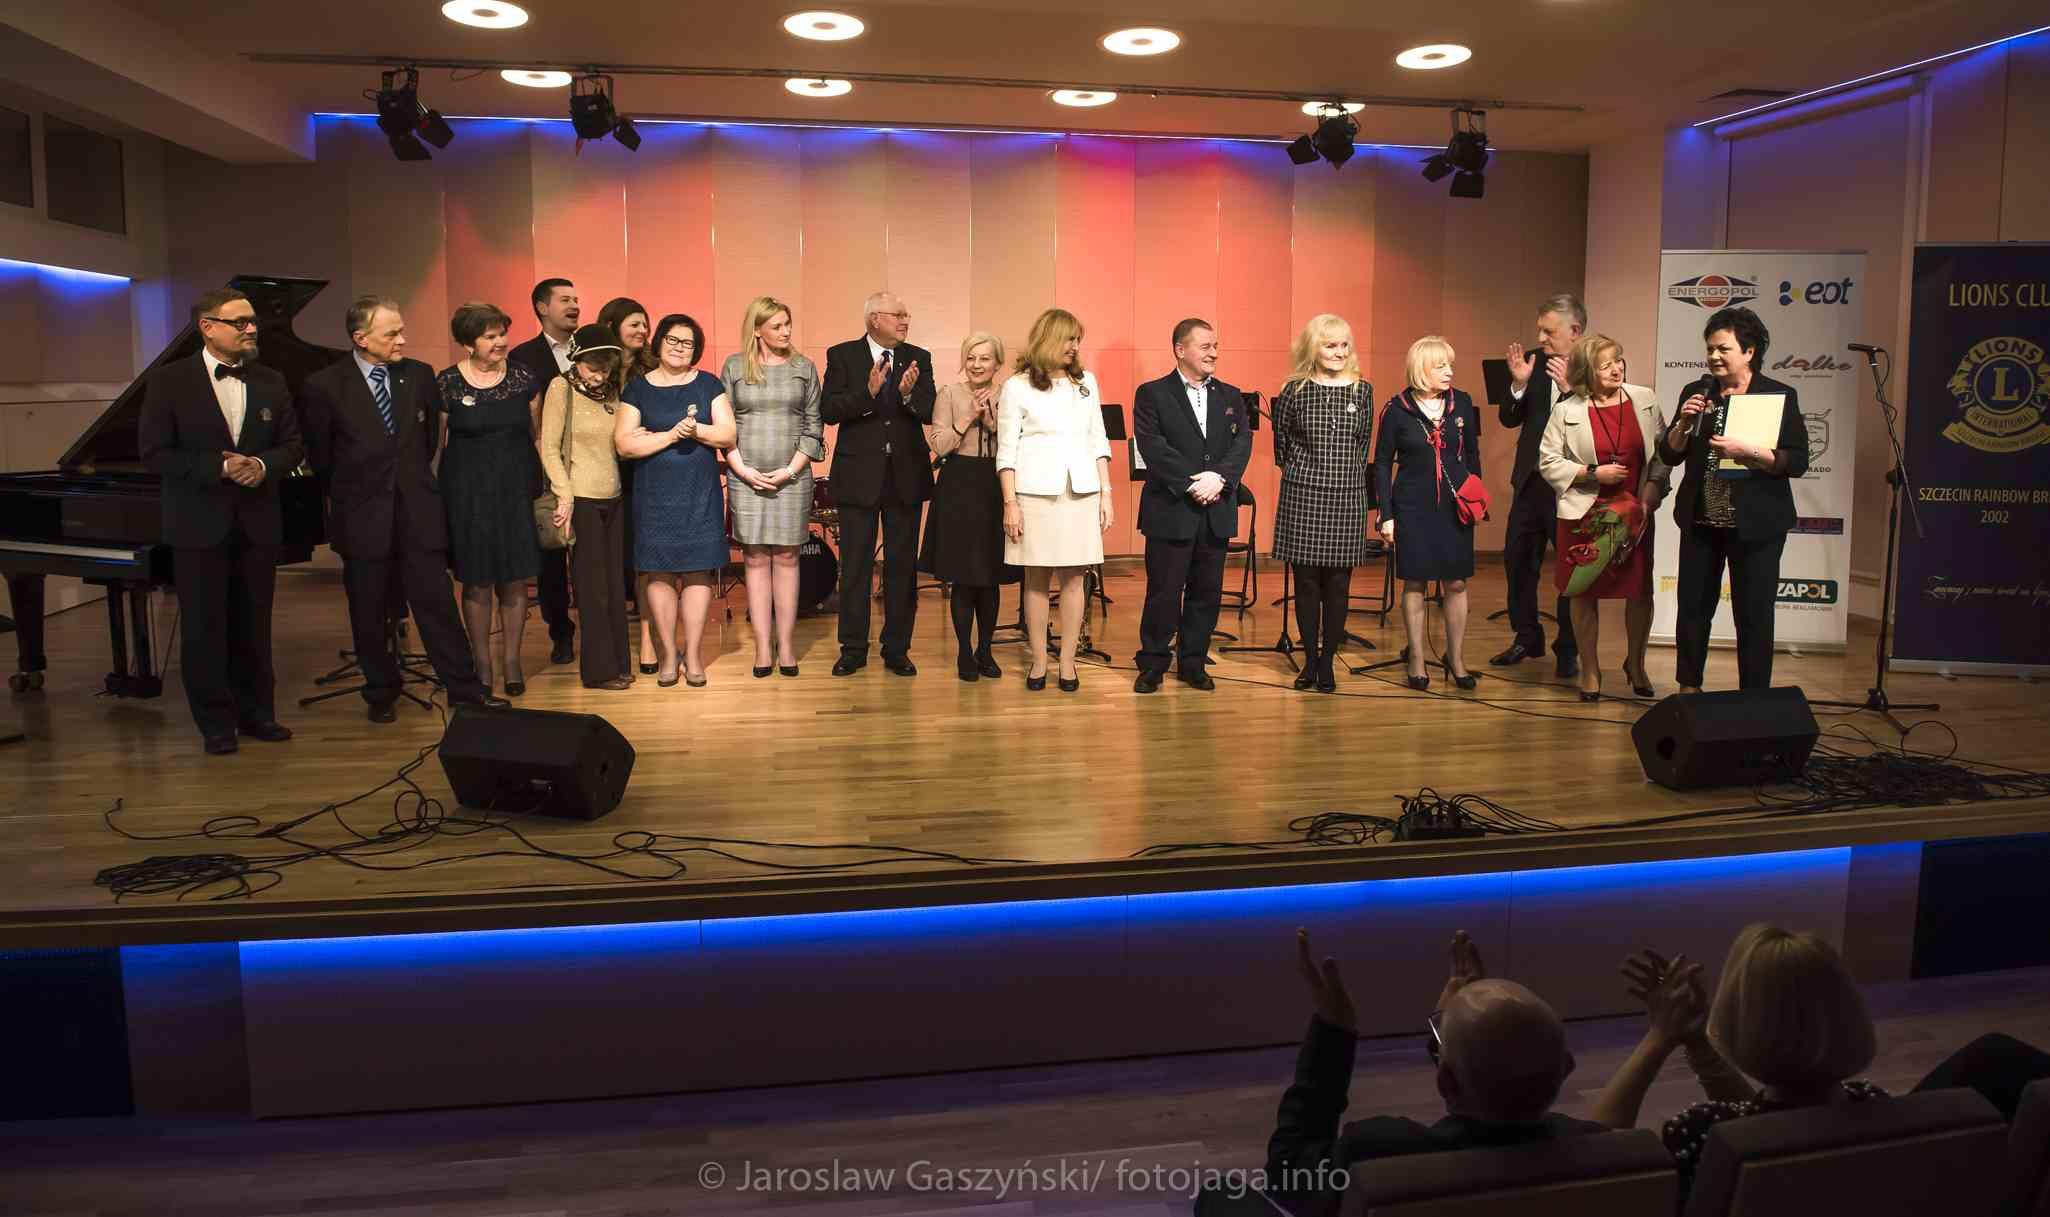 xv-lecie-lc-szczecin-rainbow-bridge-24-11-2017-r